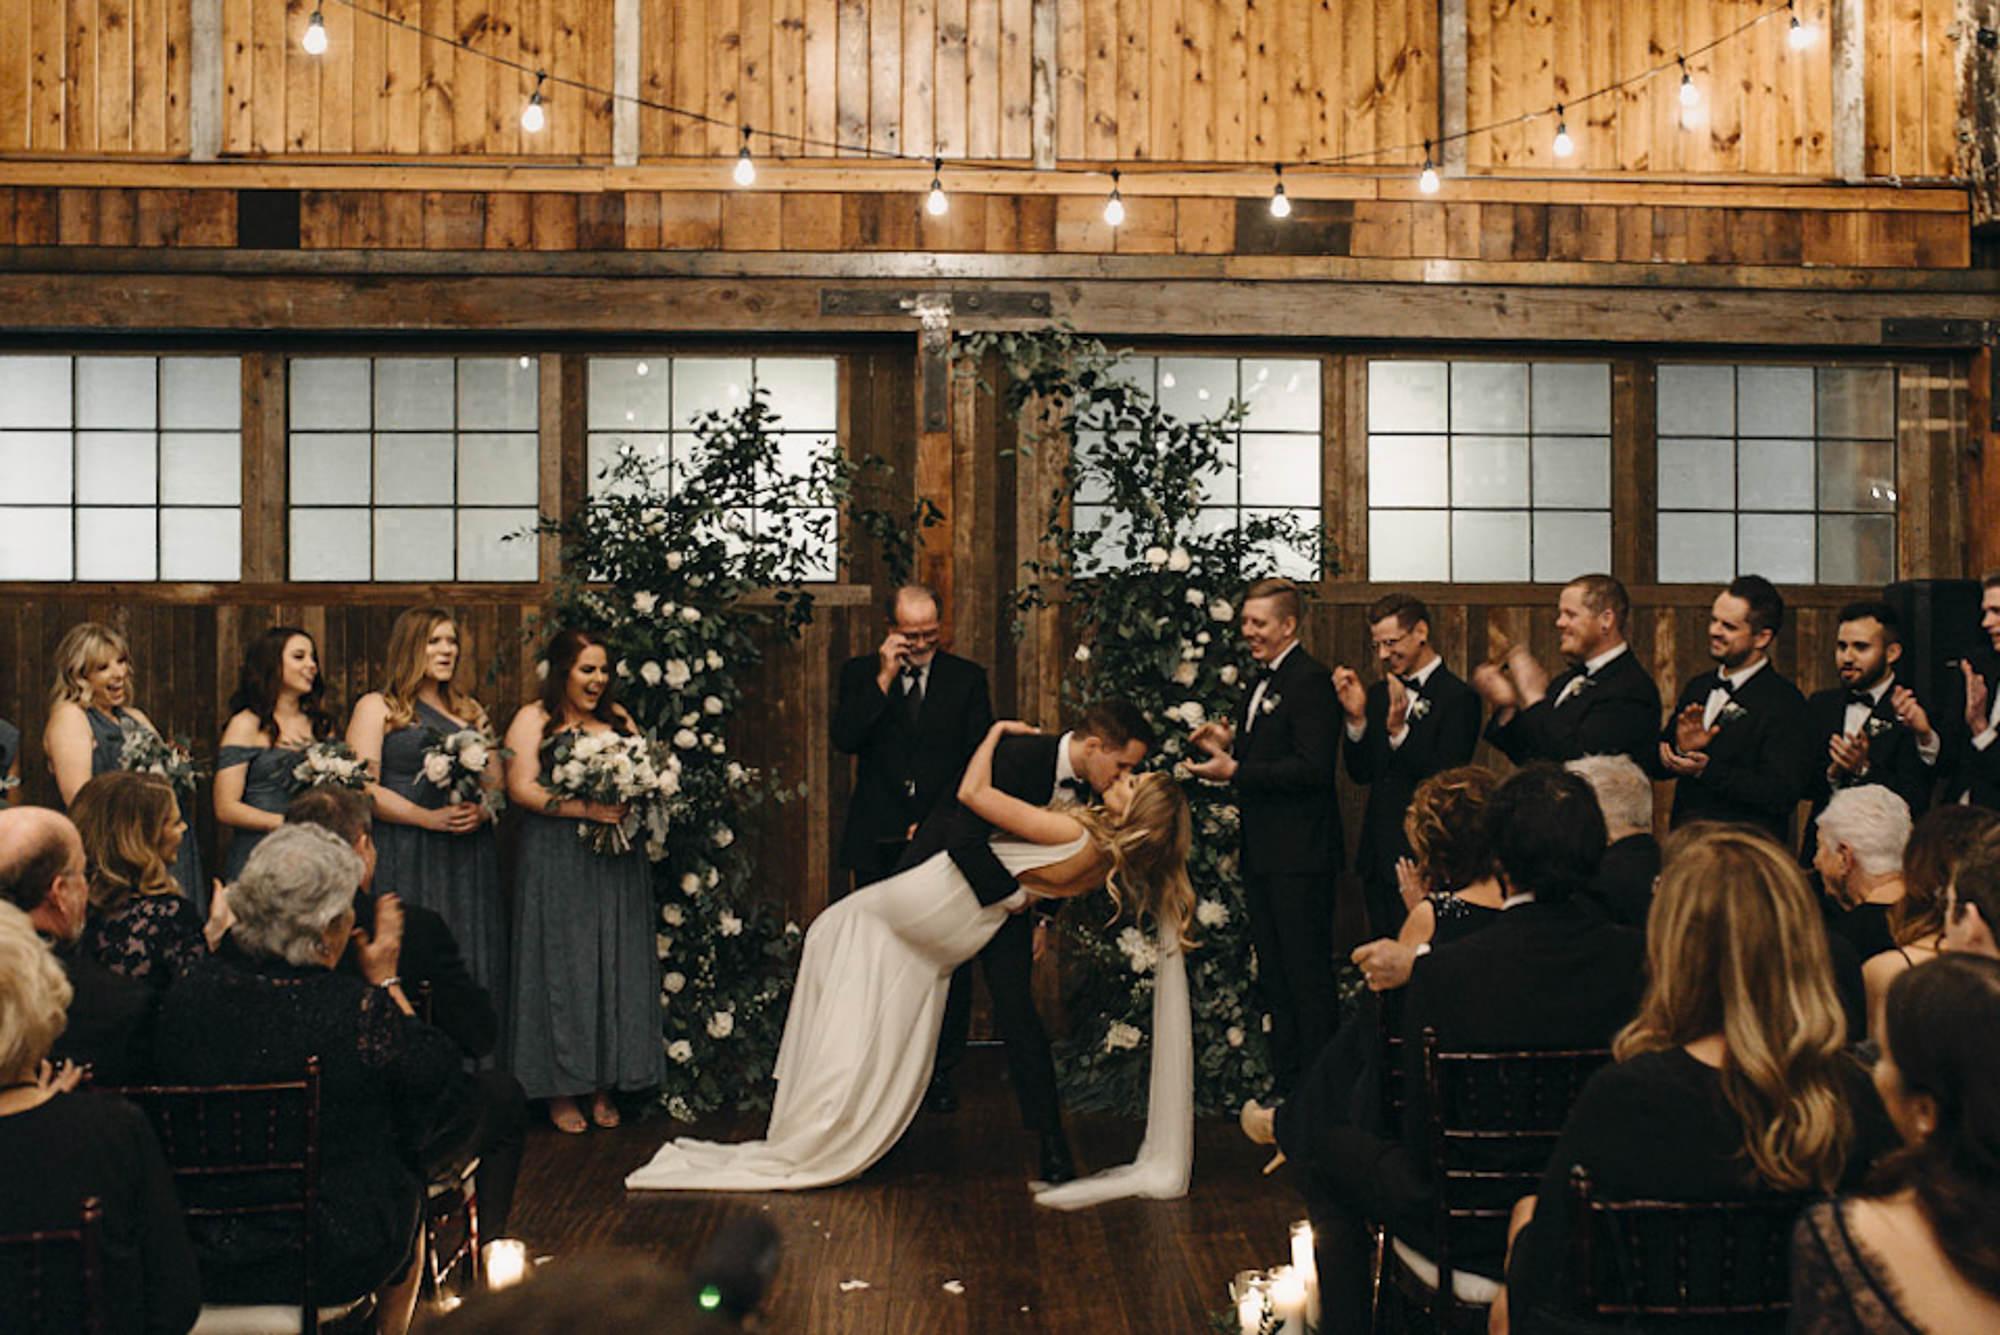 seattle-wedding-sodo-park-photographer-portland-641-12.jpg